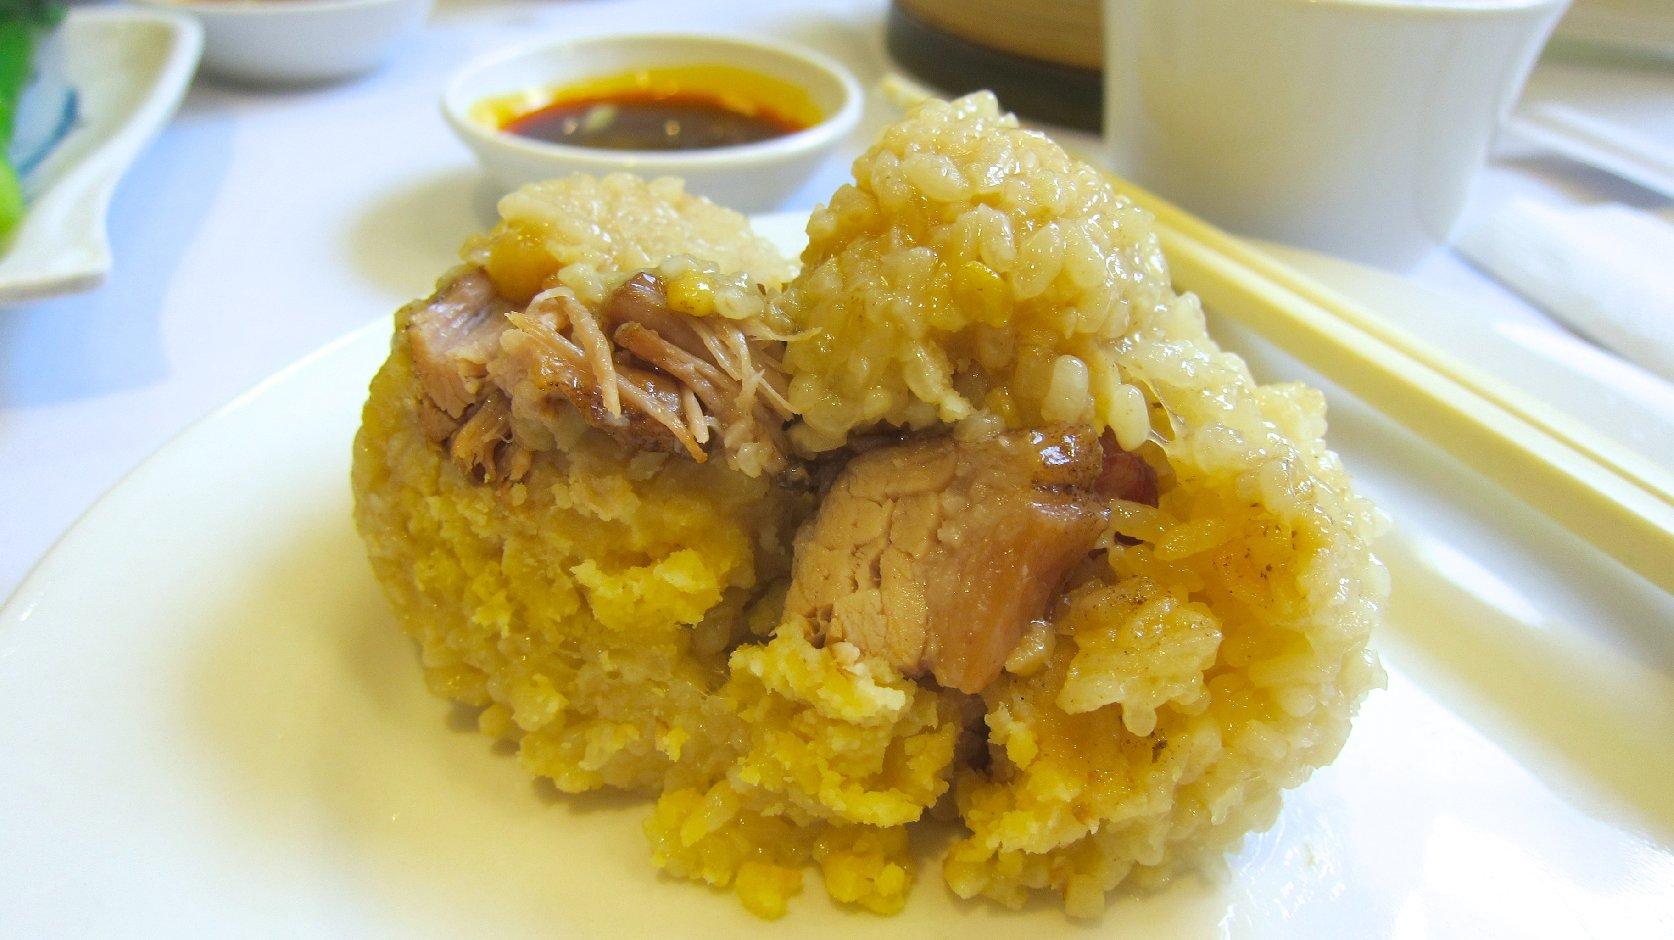 Sticky Rice with Roast Pork